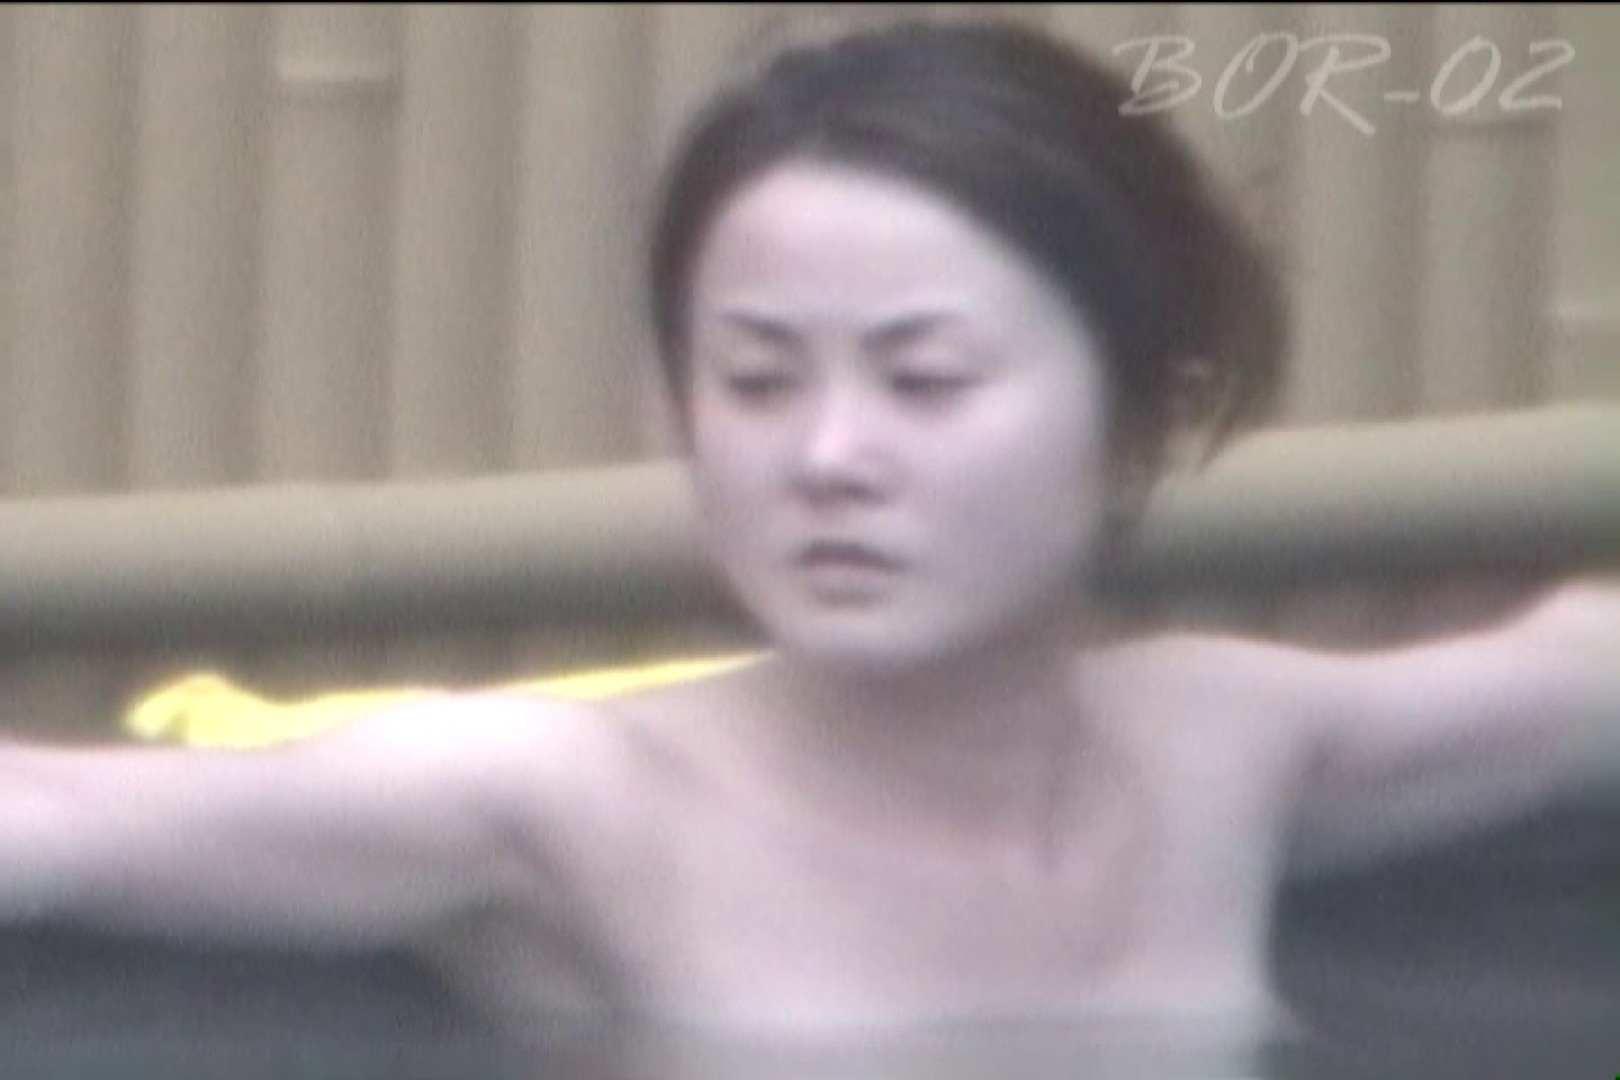 Aquaな露天風呂Vol.474 盗撮シリーズ | 露天風呂編  111PIX 105